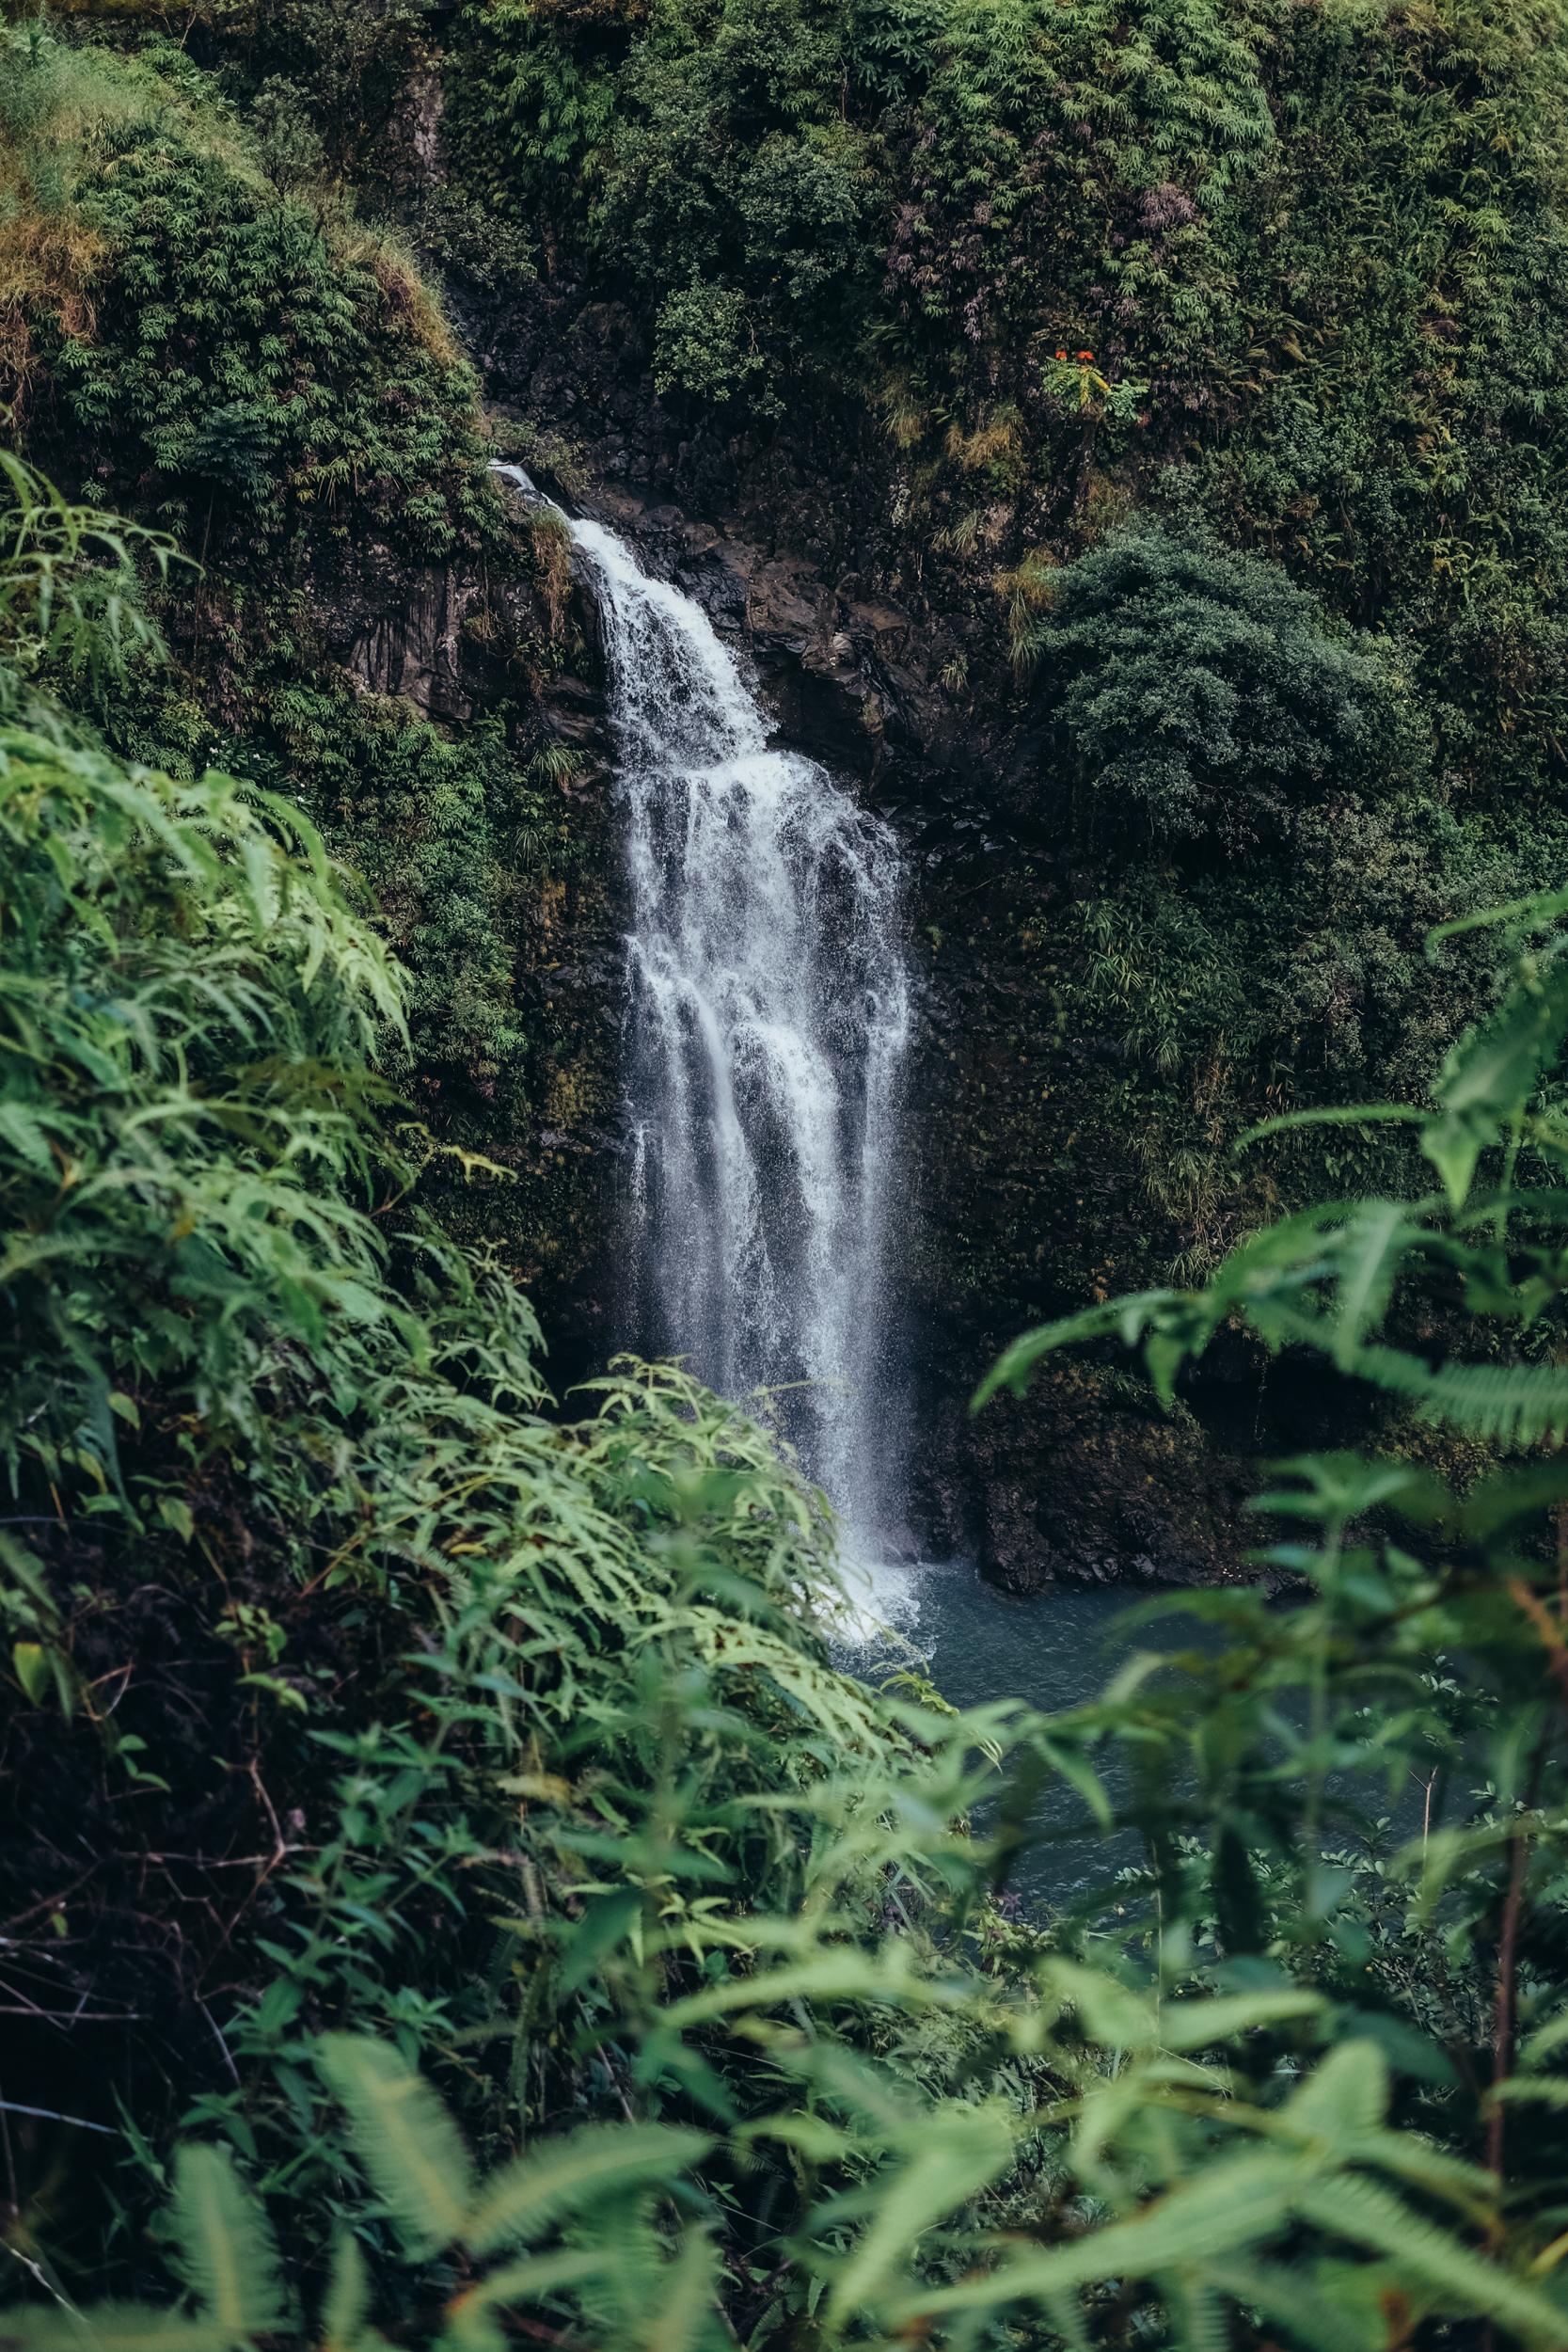 Maui043.jpg